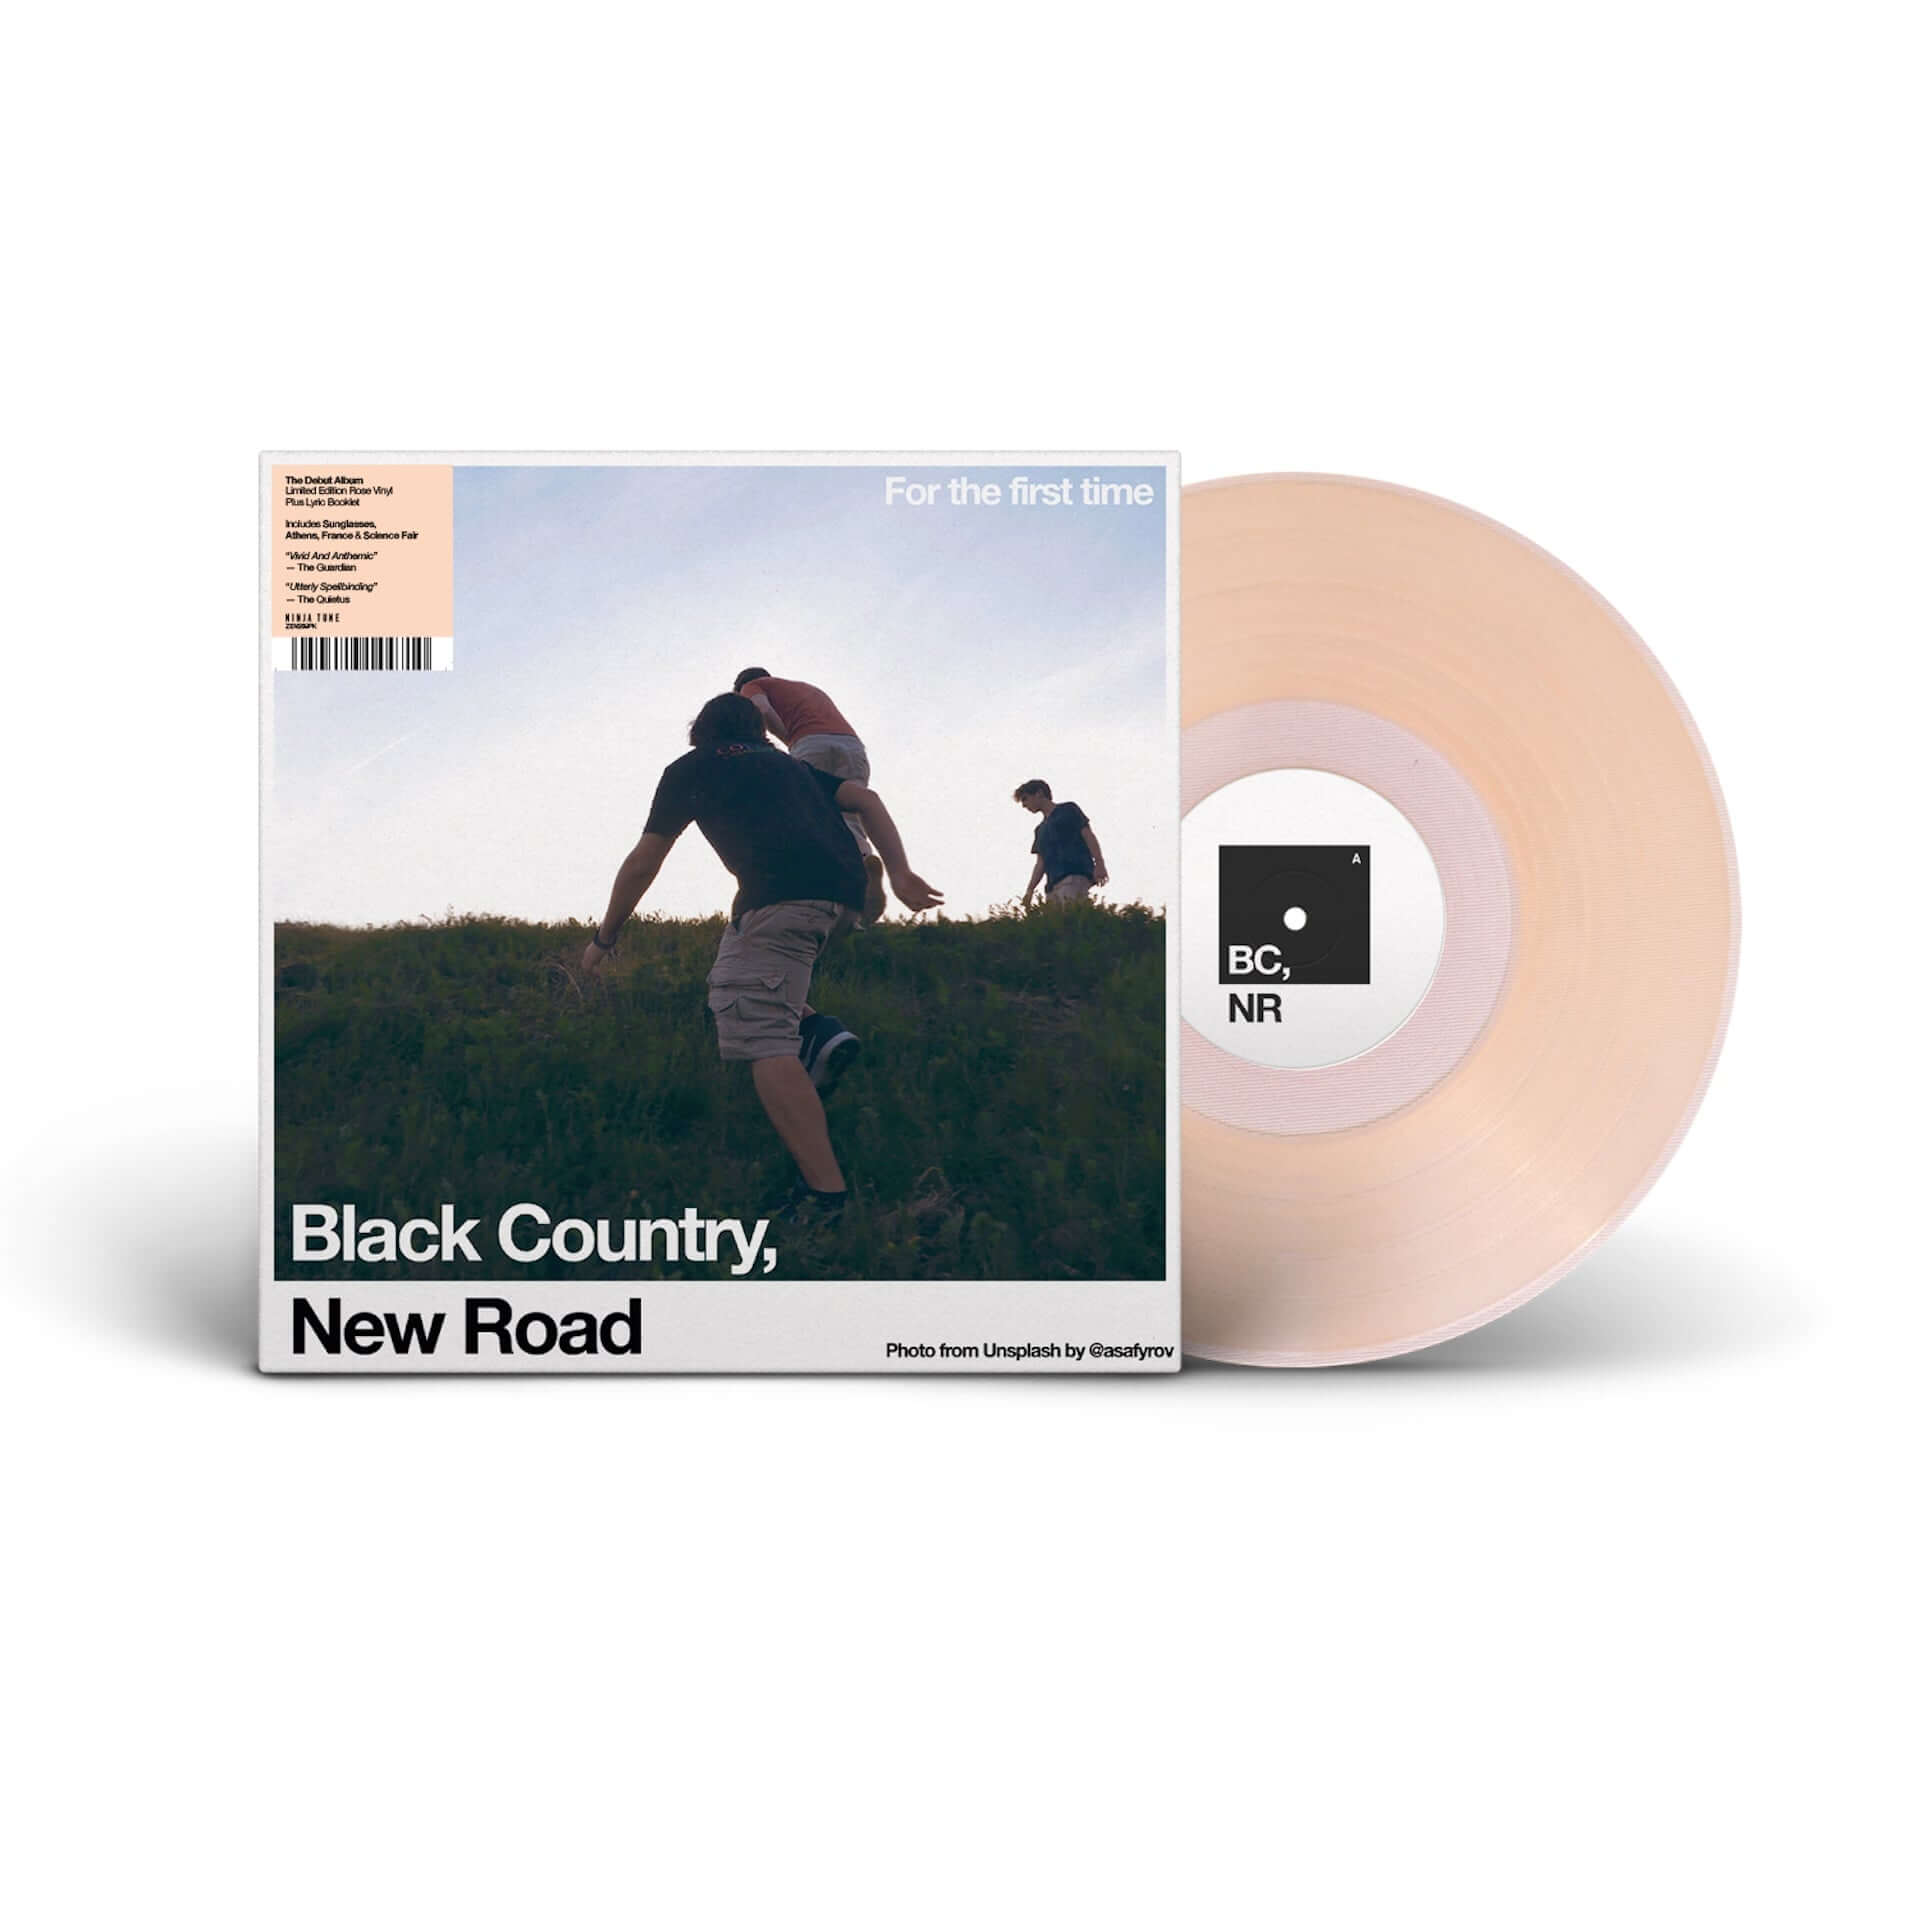 black midiとBlack Country, New Roadがコラボ!24時間限定のライブ配信がBandcampにて実施決定 music201209_blackmidi-bcnr_7-1920x1920